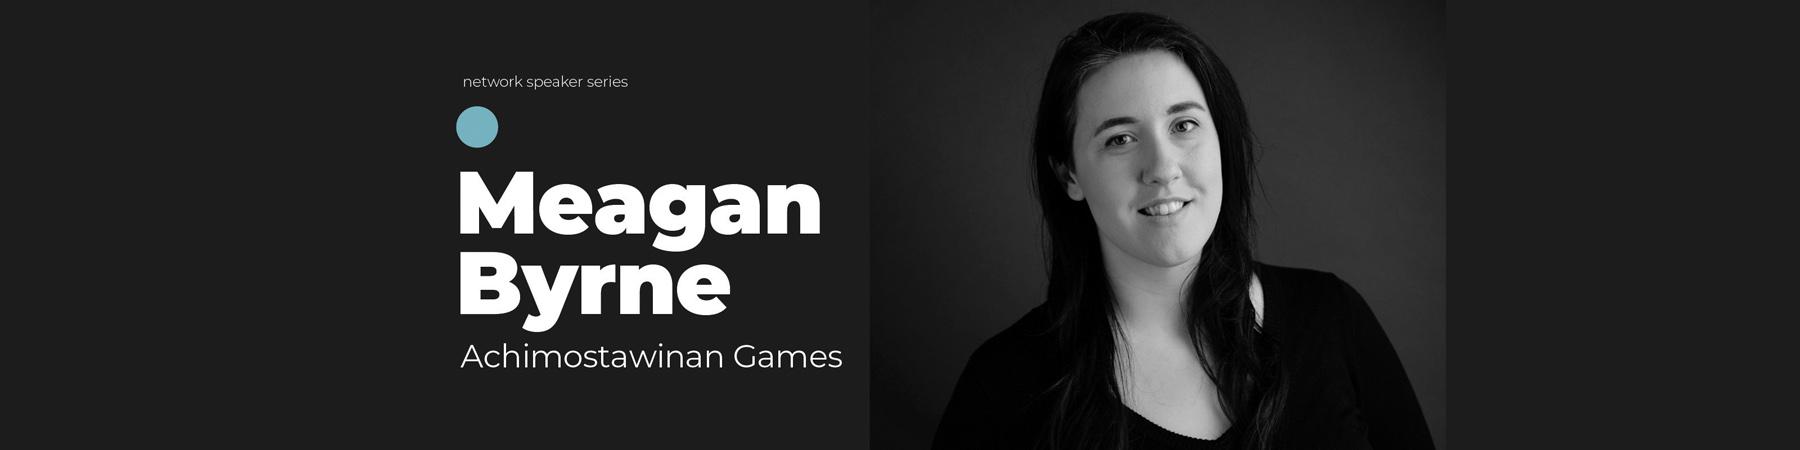 Meagan Byrne - Achimostawinan Games